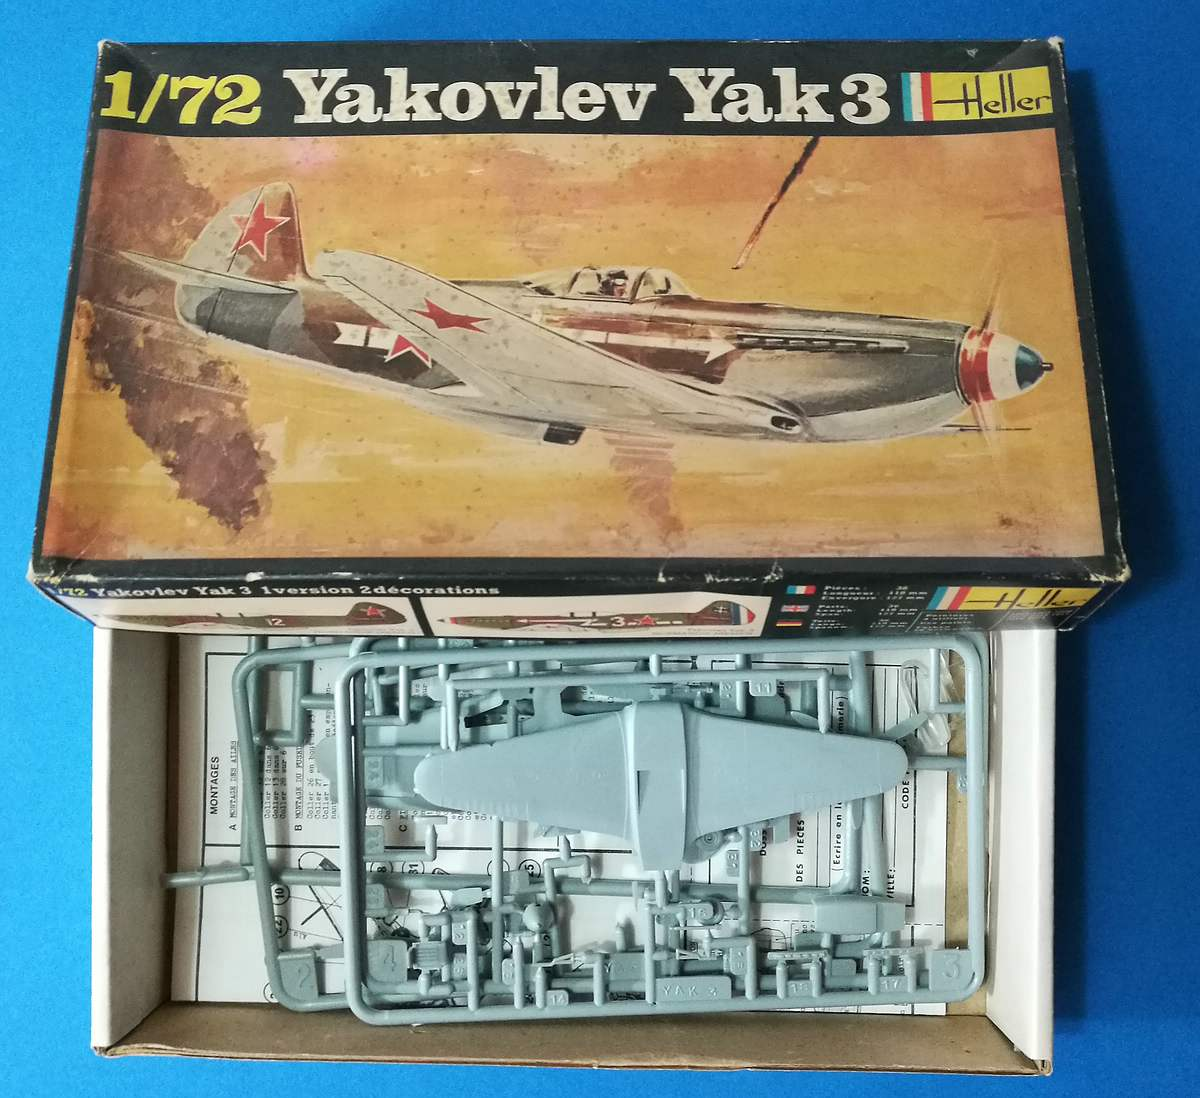 HELLER-L-090-Yak-3-Normandie-Niemen-5 Kit-Archäologie: Yak-3 Normandie-Niemen in 1:72 von HELLER # L 060